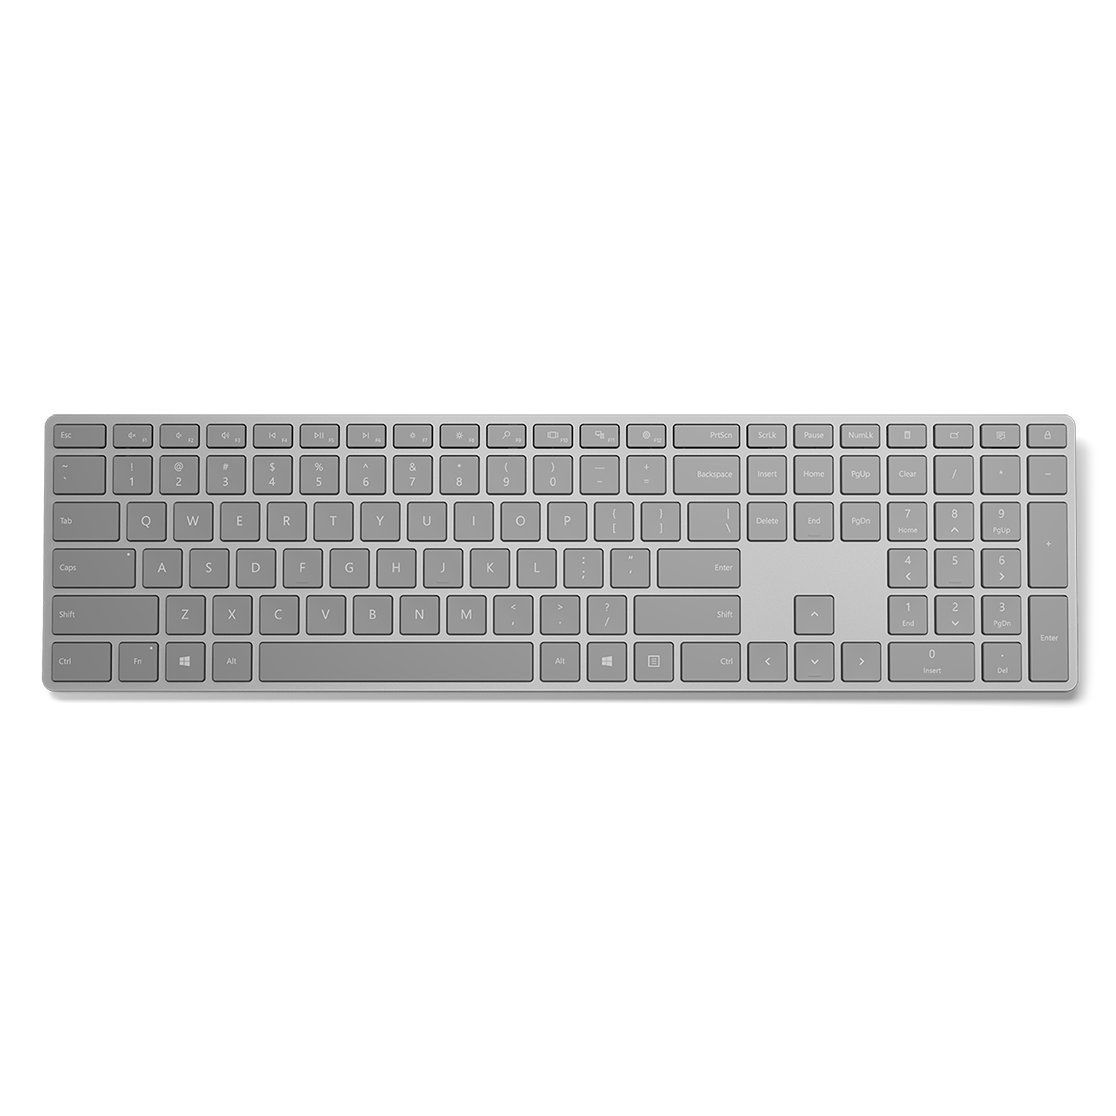 14 Best Wireless Keyboards In 2018   Universal Bluetooth Keyboards For  Every Device